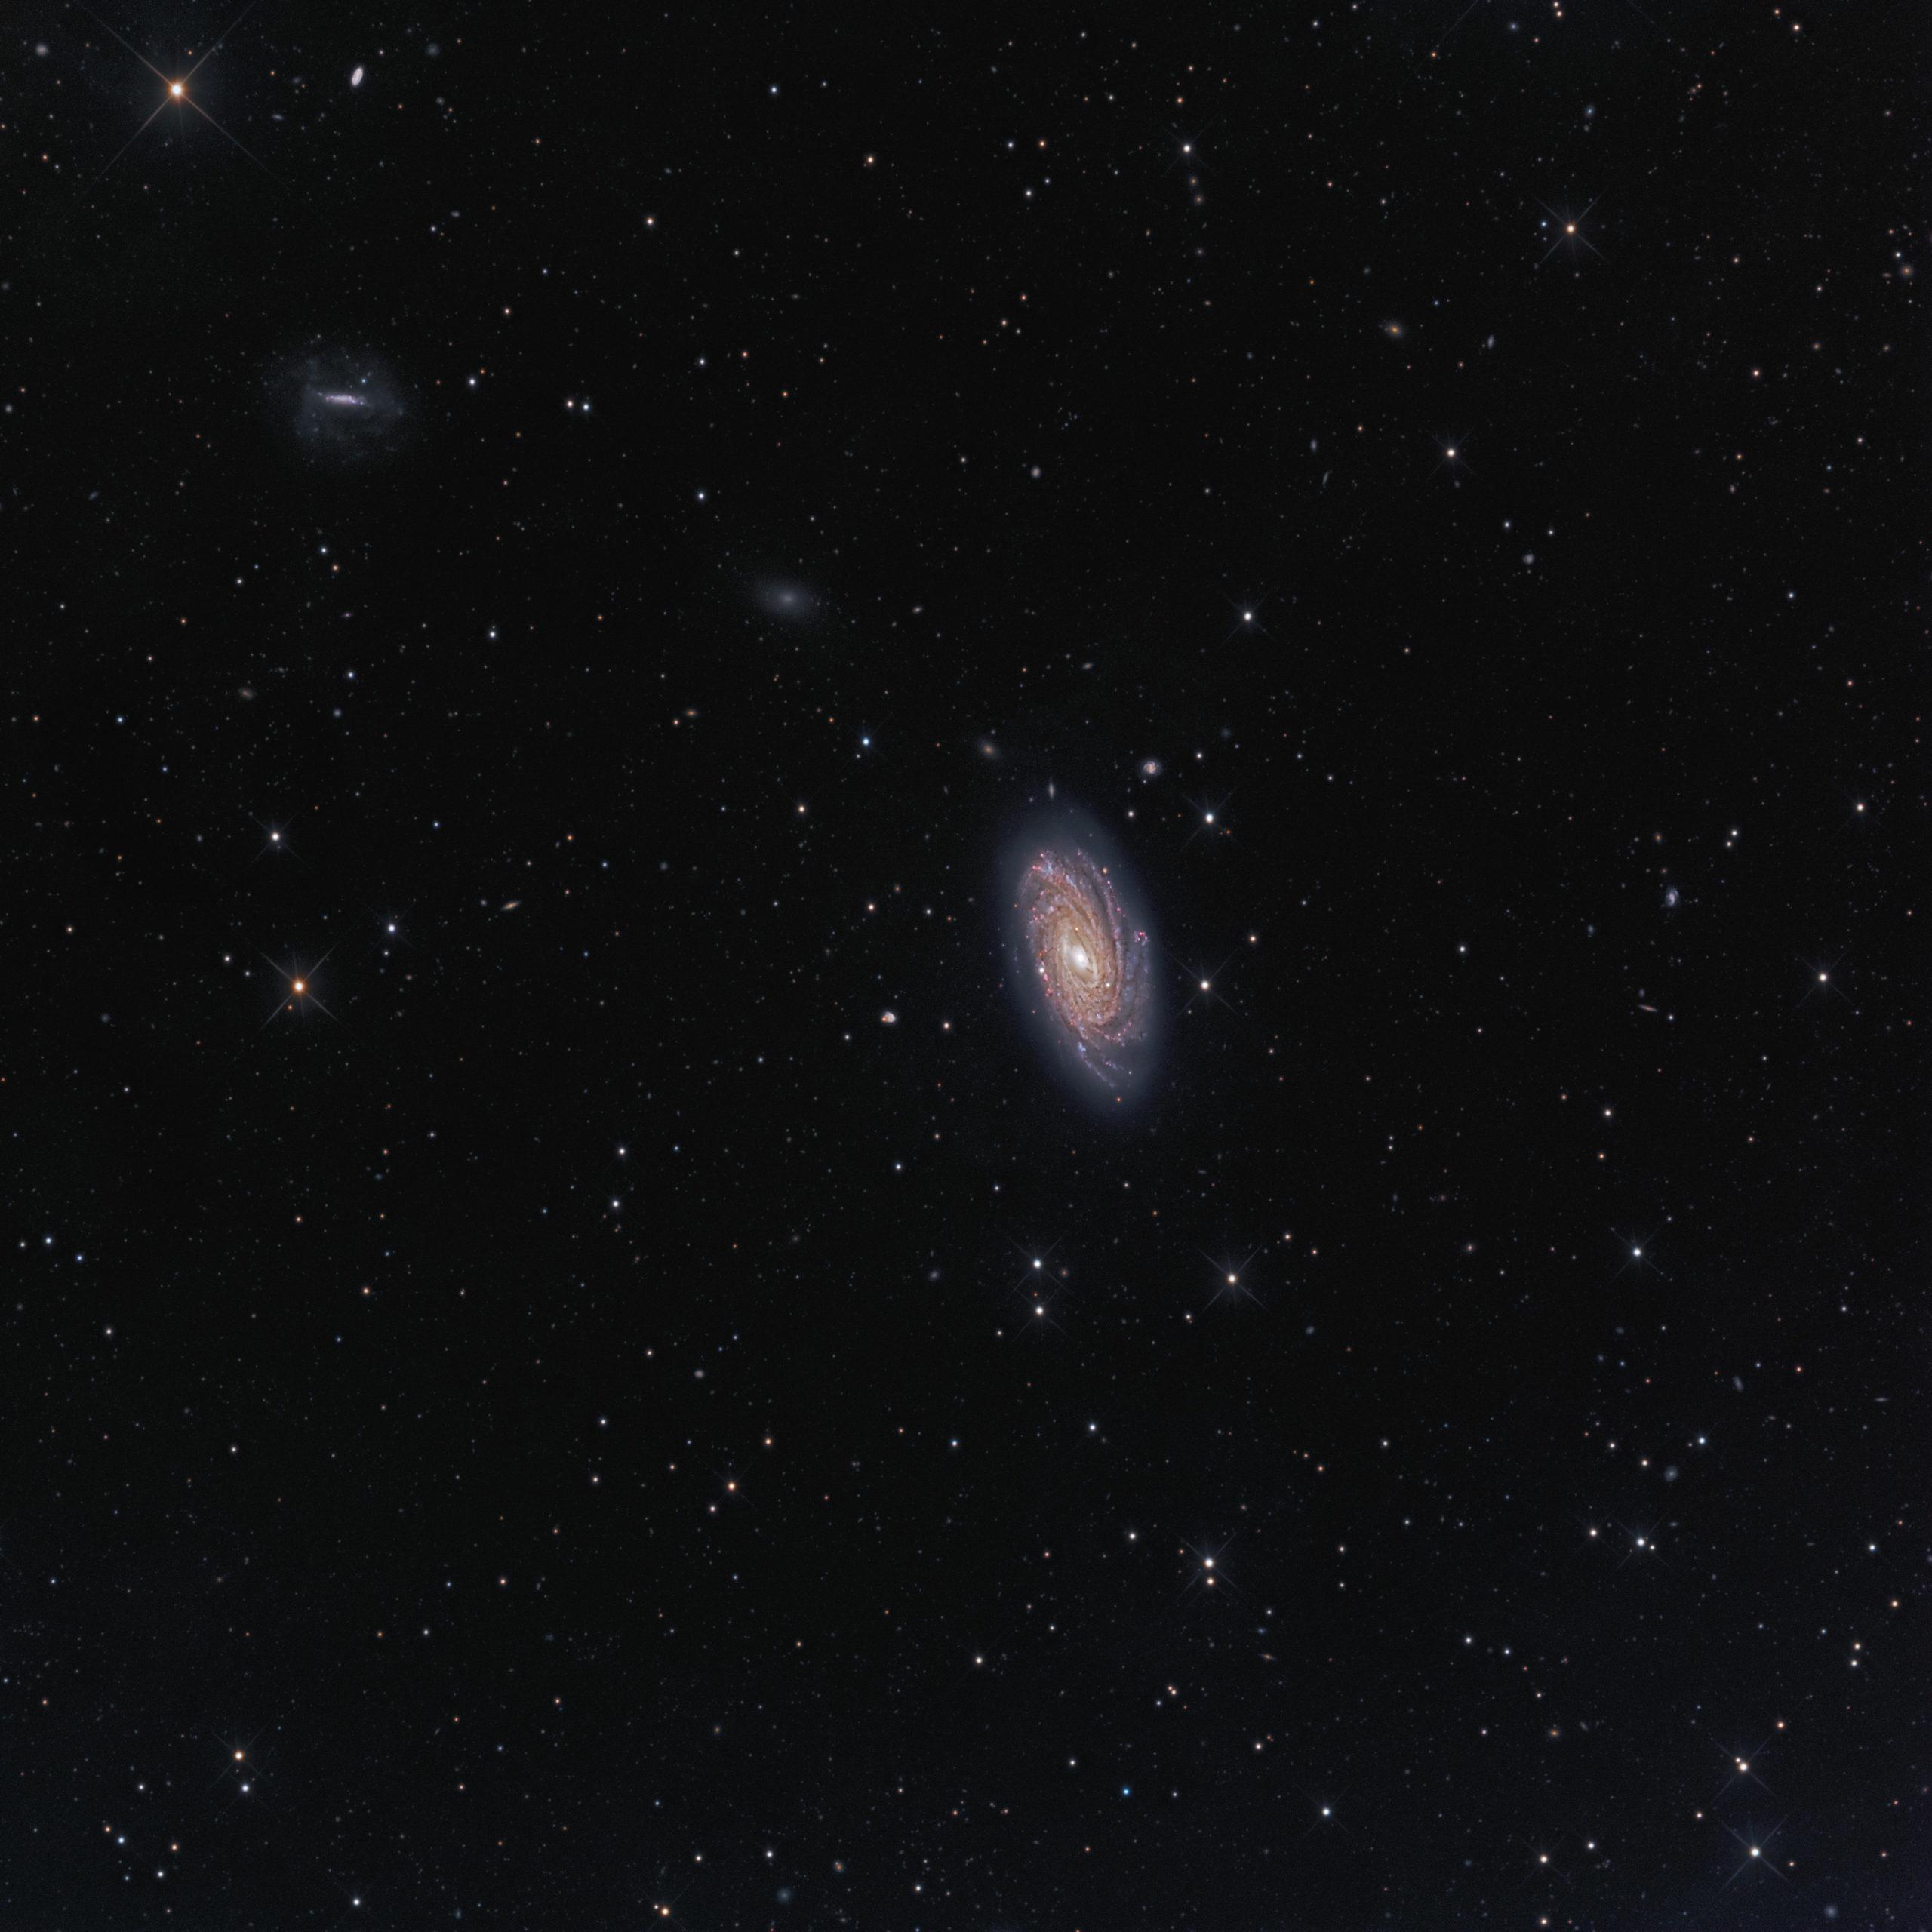 NGC 3953 Galaxy Astrophotography Martin Rusterholz